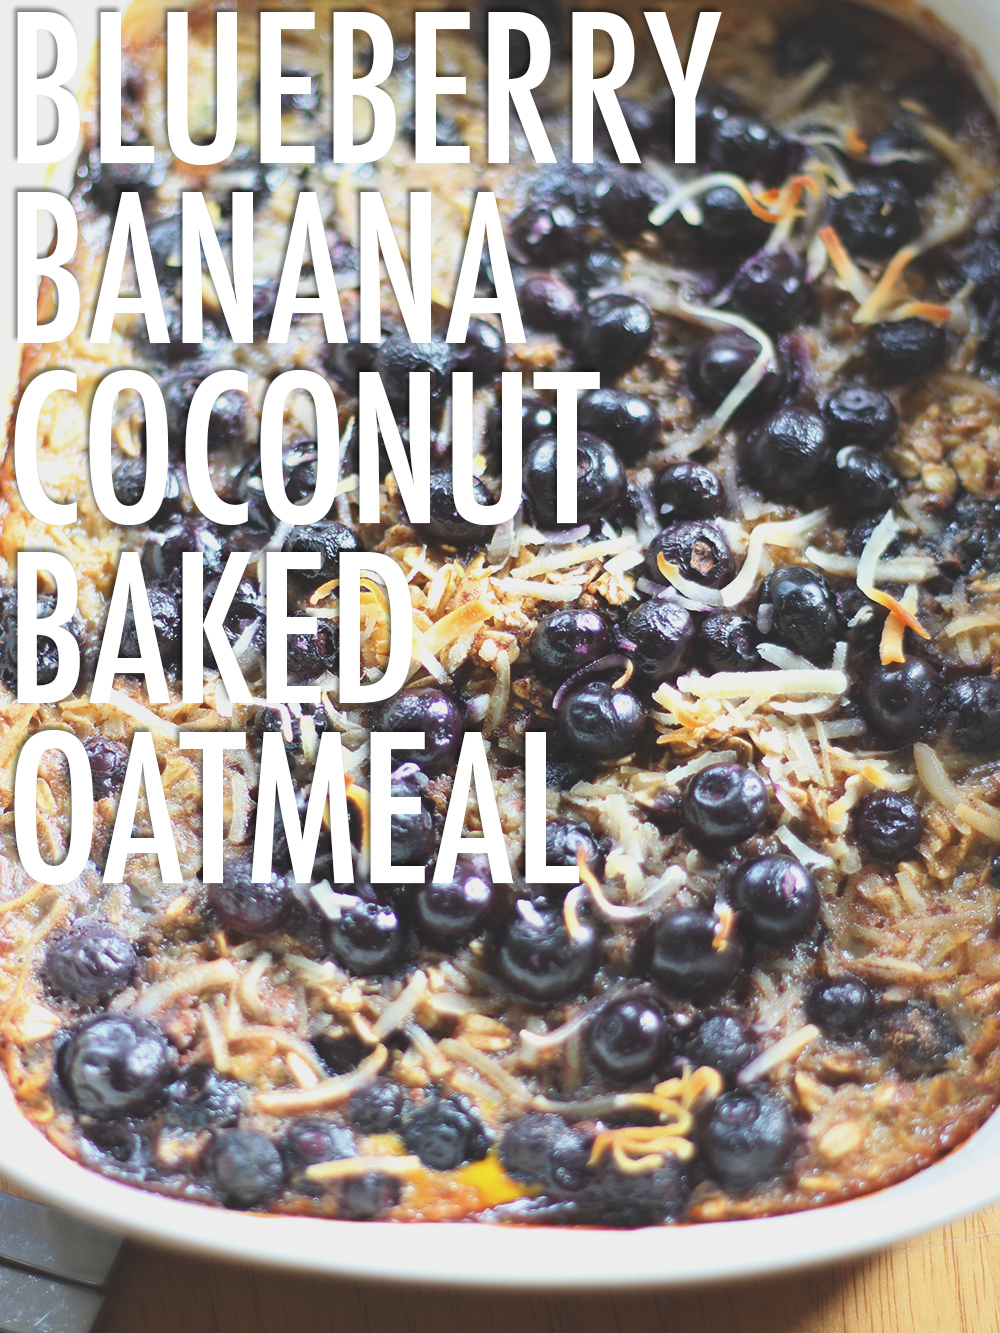 Blueberry, banana, & coconut baked oatmeal!